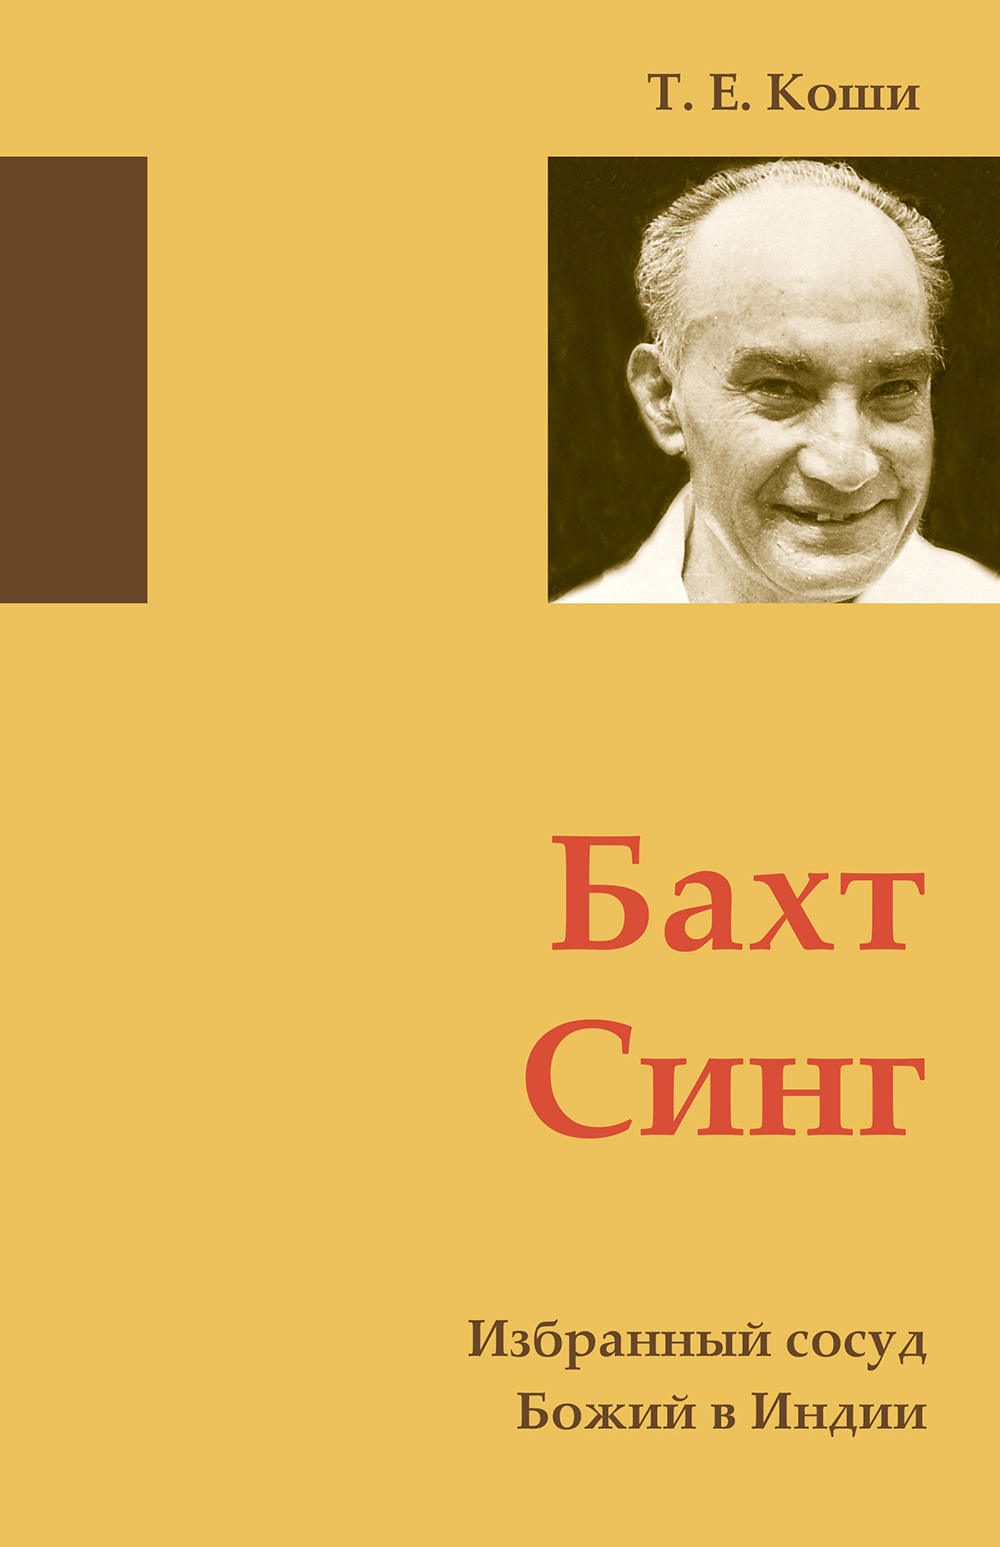 CLV_bakht-singh-russisch_t-e-koshy_256322_1